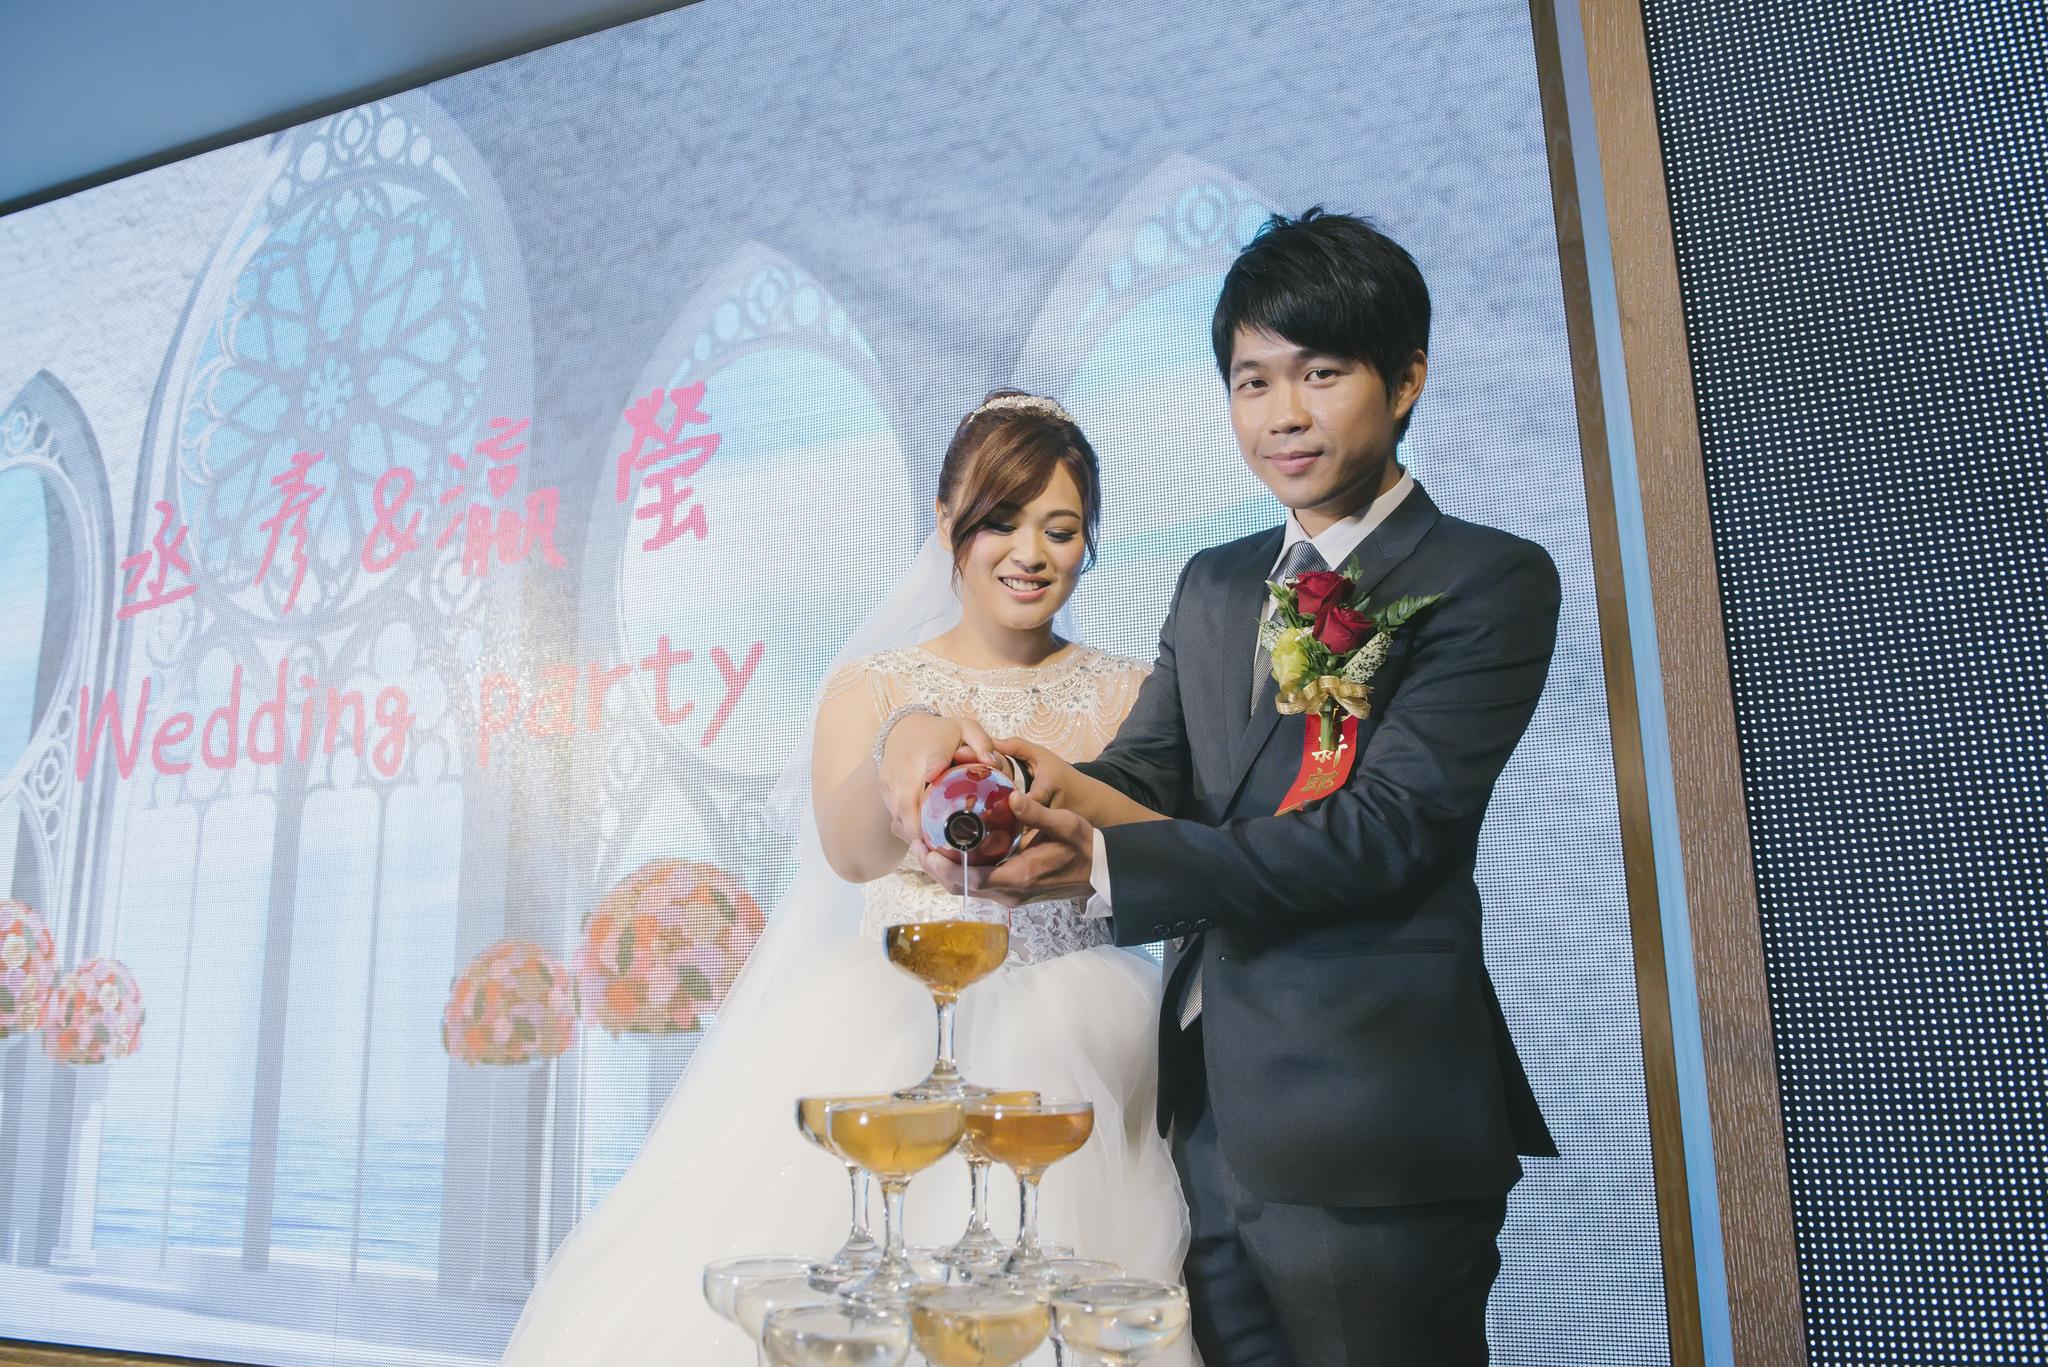 28629712130 846b1f0067 k - 婚禮紀錄作品|WEDDING DAY